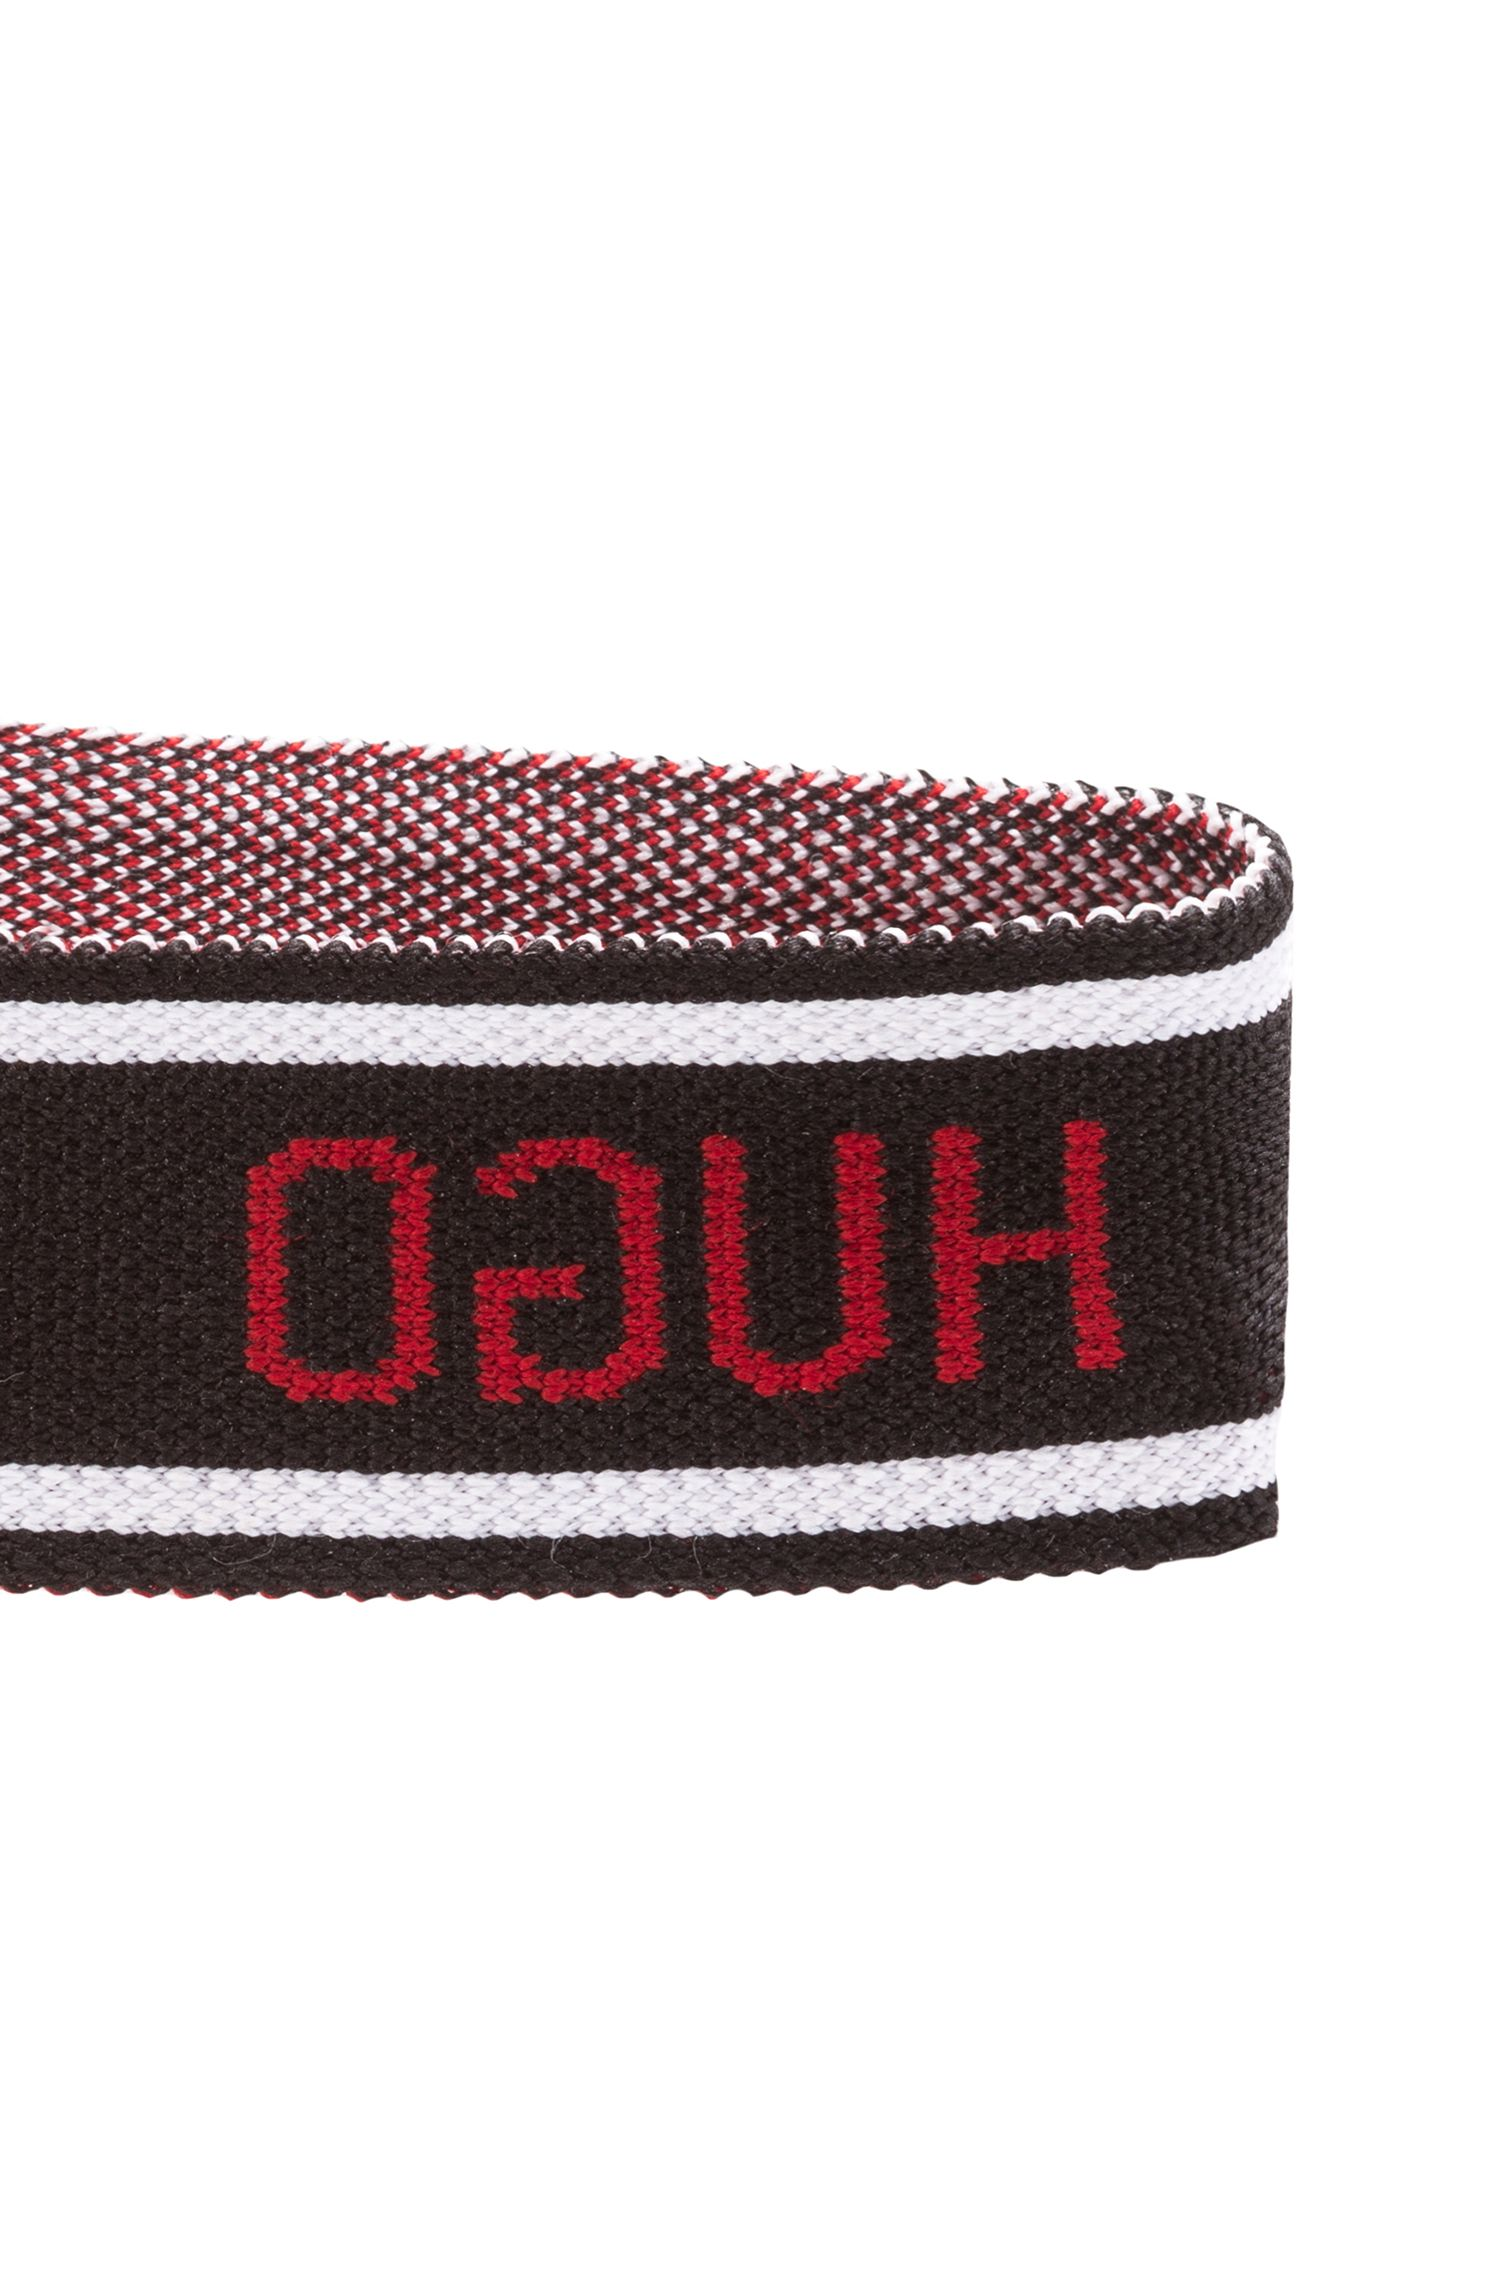 Unisex logo headband in knitted jacquard, Black